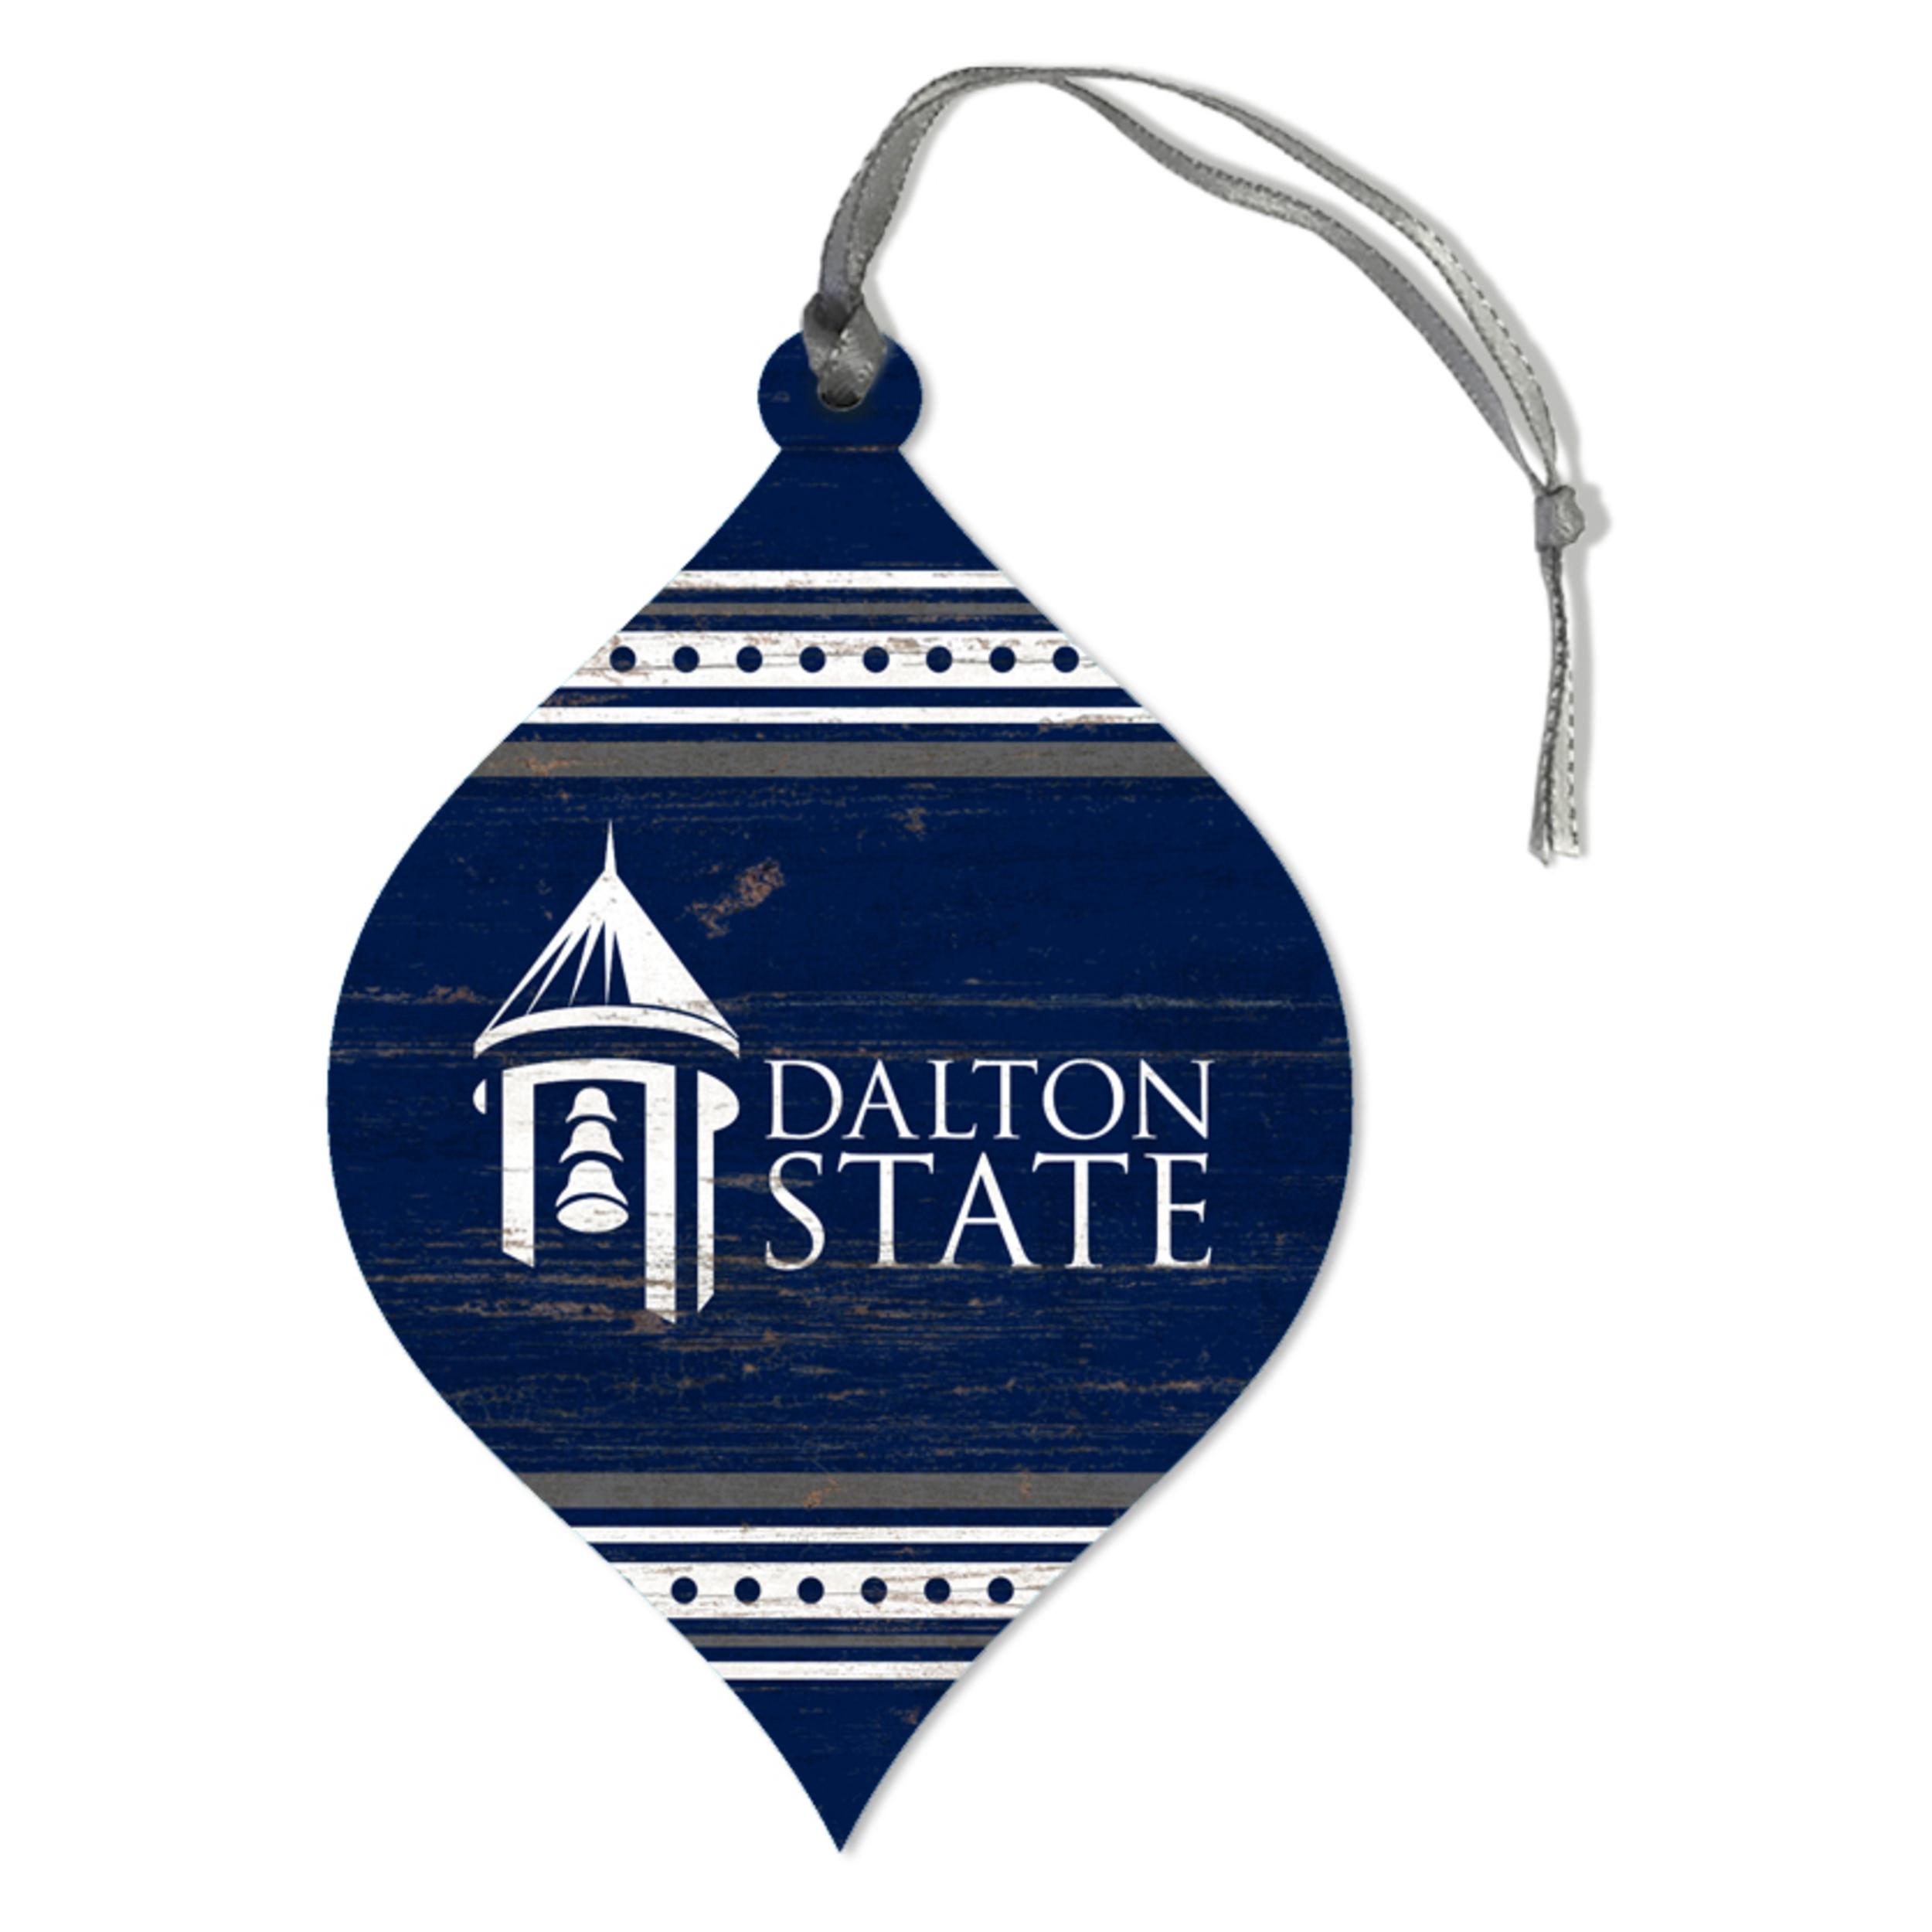 Dalton State Teardrop Ornament